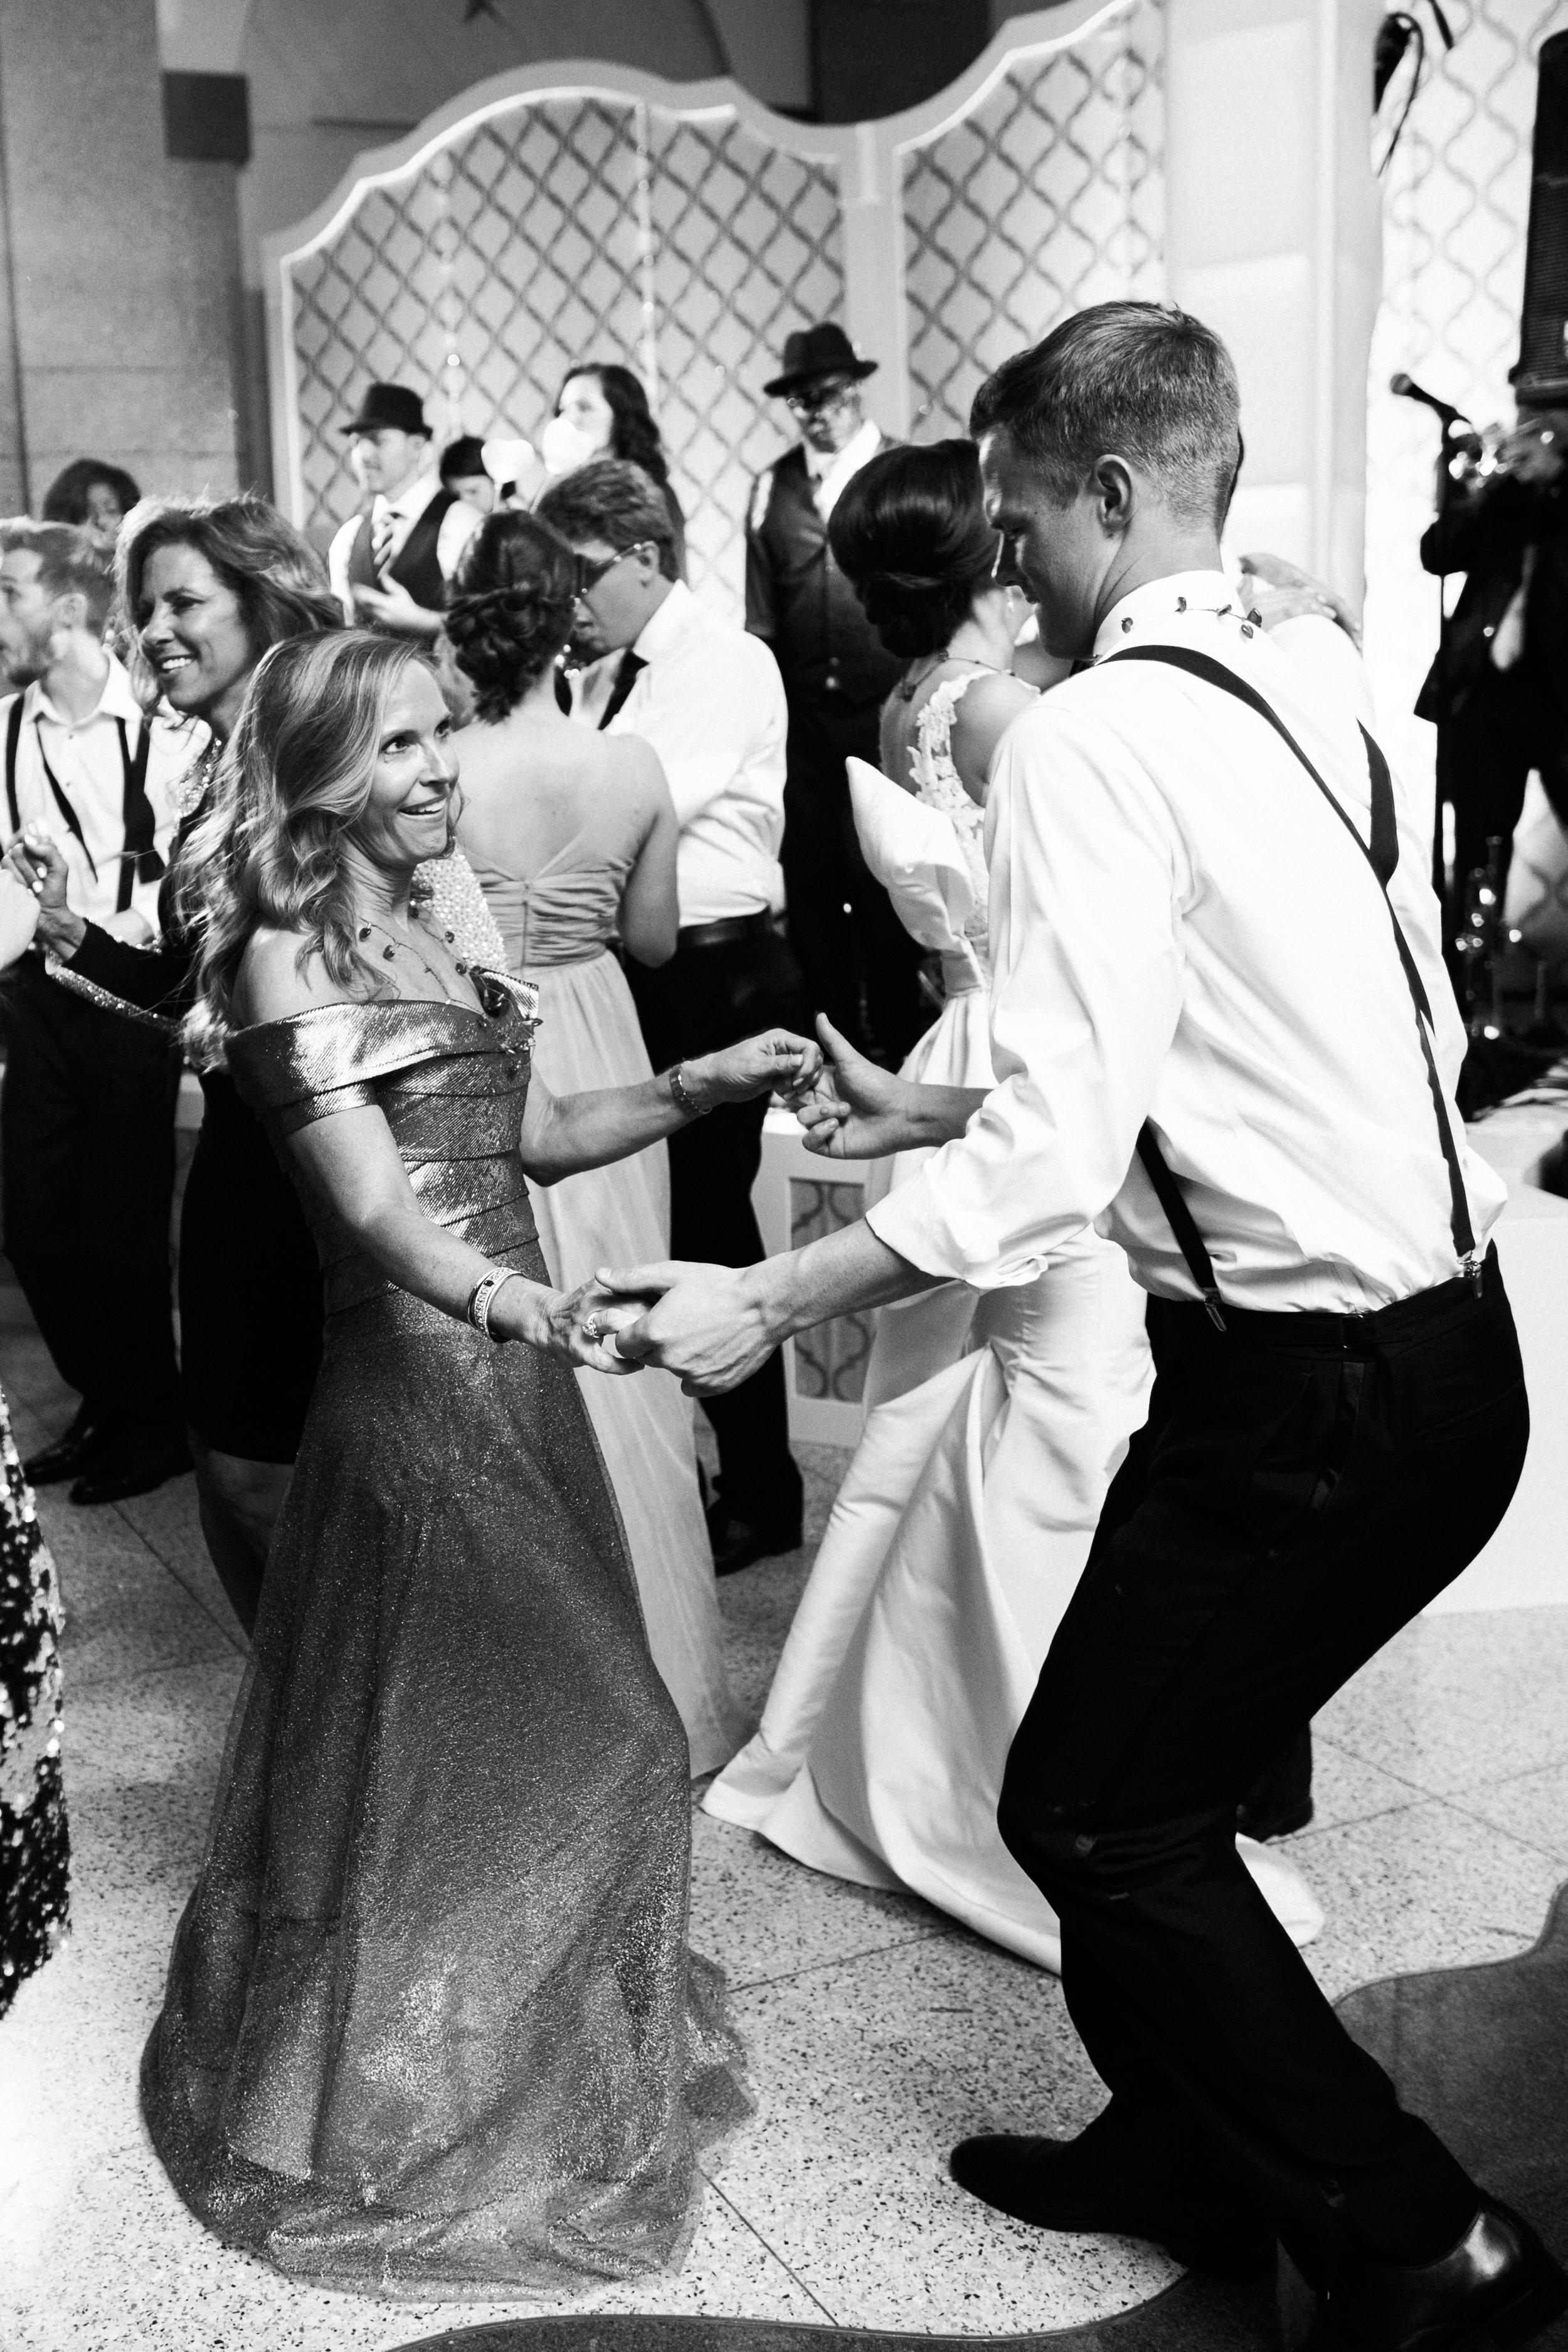 caroline_events_destination_wedding_planner_austin_bullock_museum_wedding